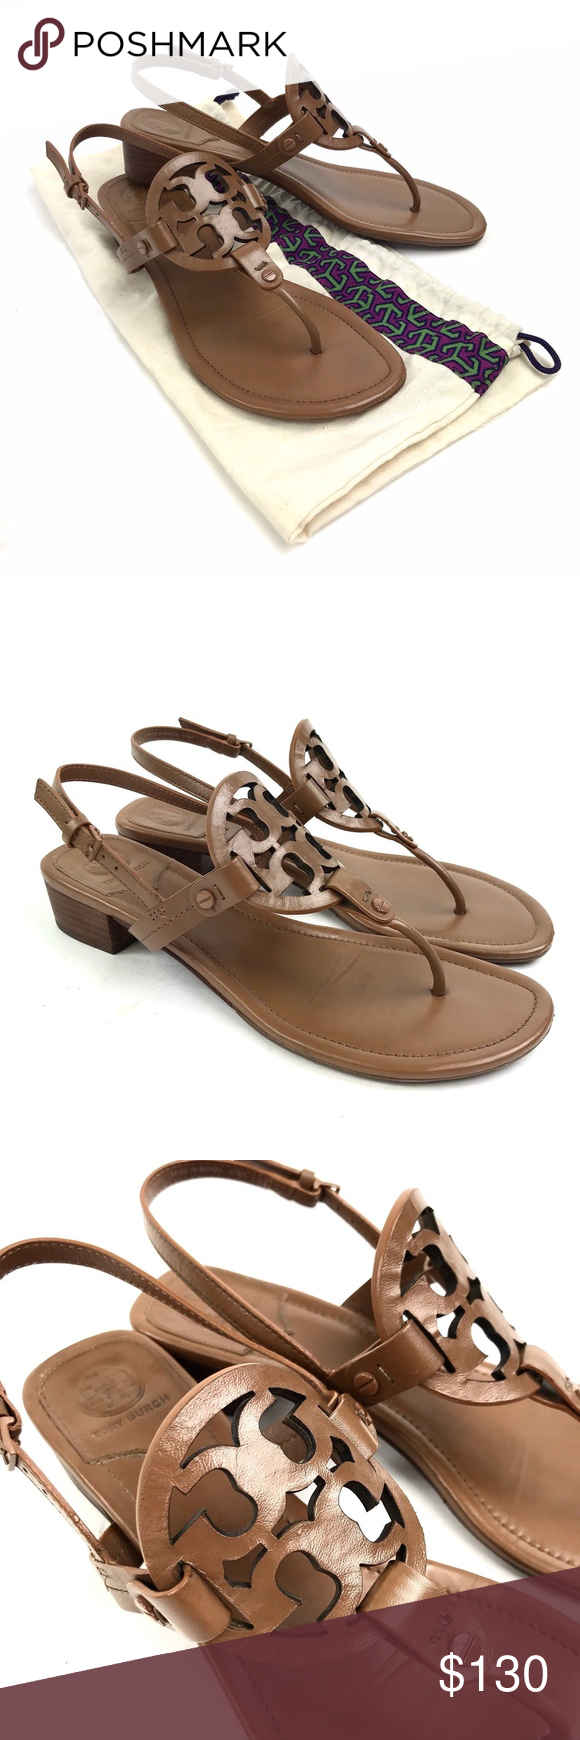 f1b24098549538 Tory Burch Miller Tan Block Heel Leather Sandal Tory Burch Women s Miller  Royal Tan Slingback Block